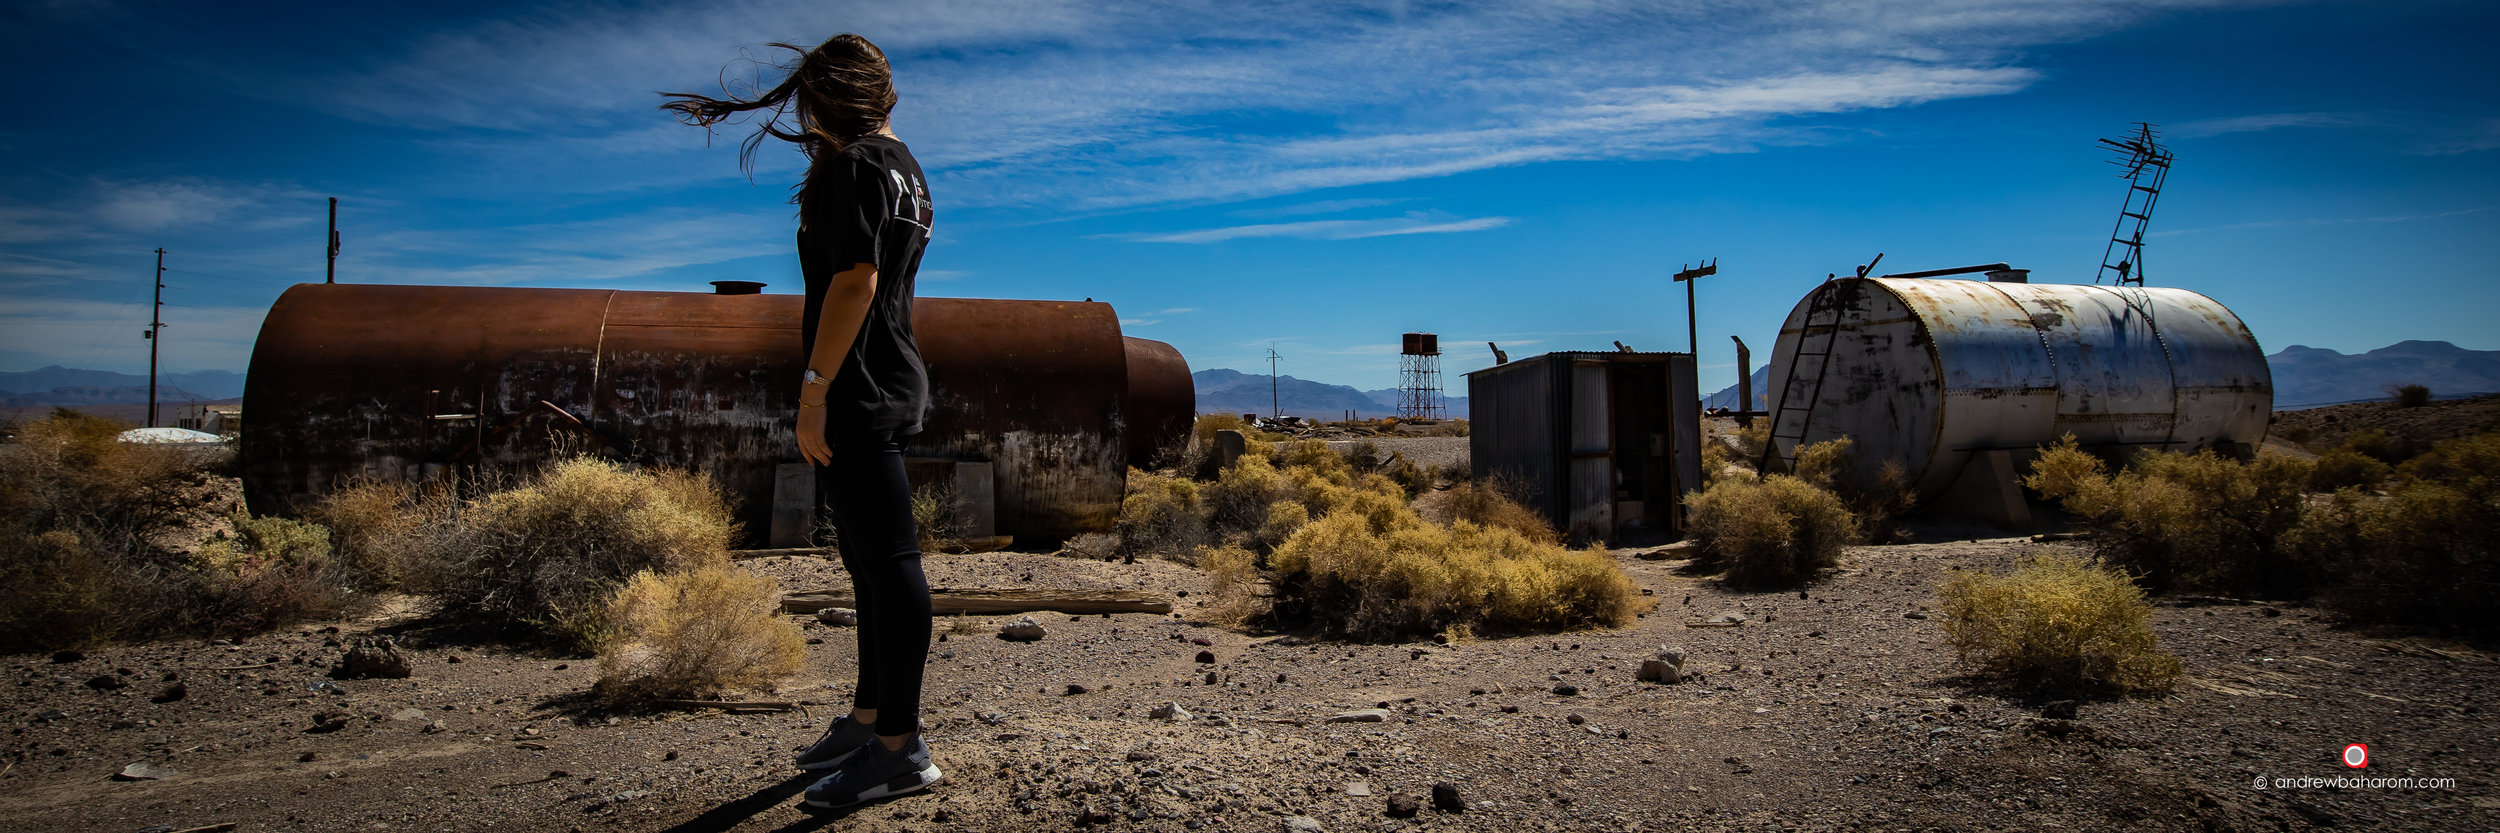 Death Valley Tanks.jpg